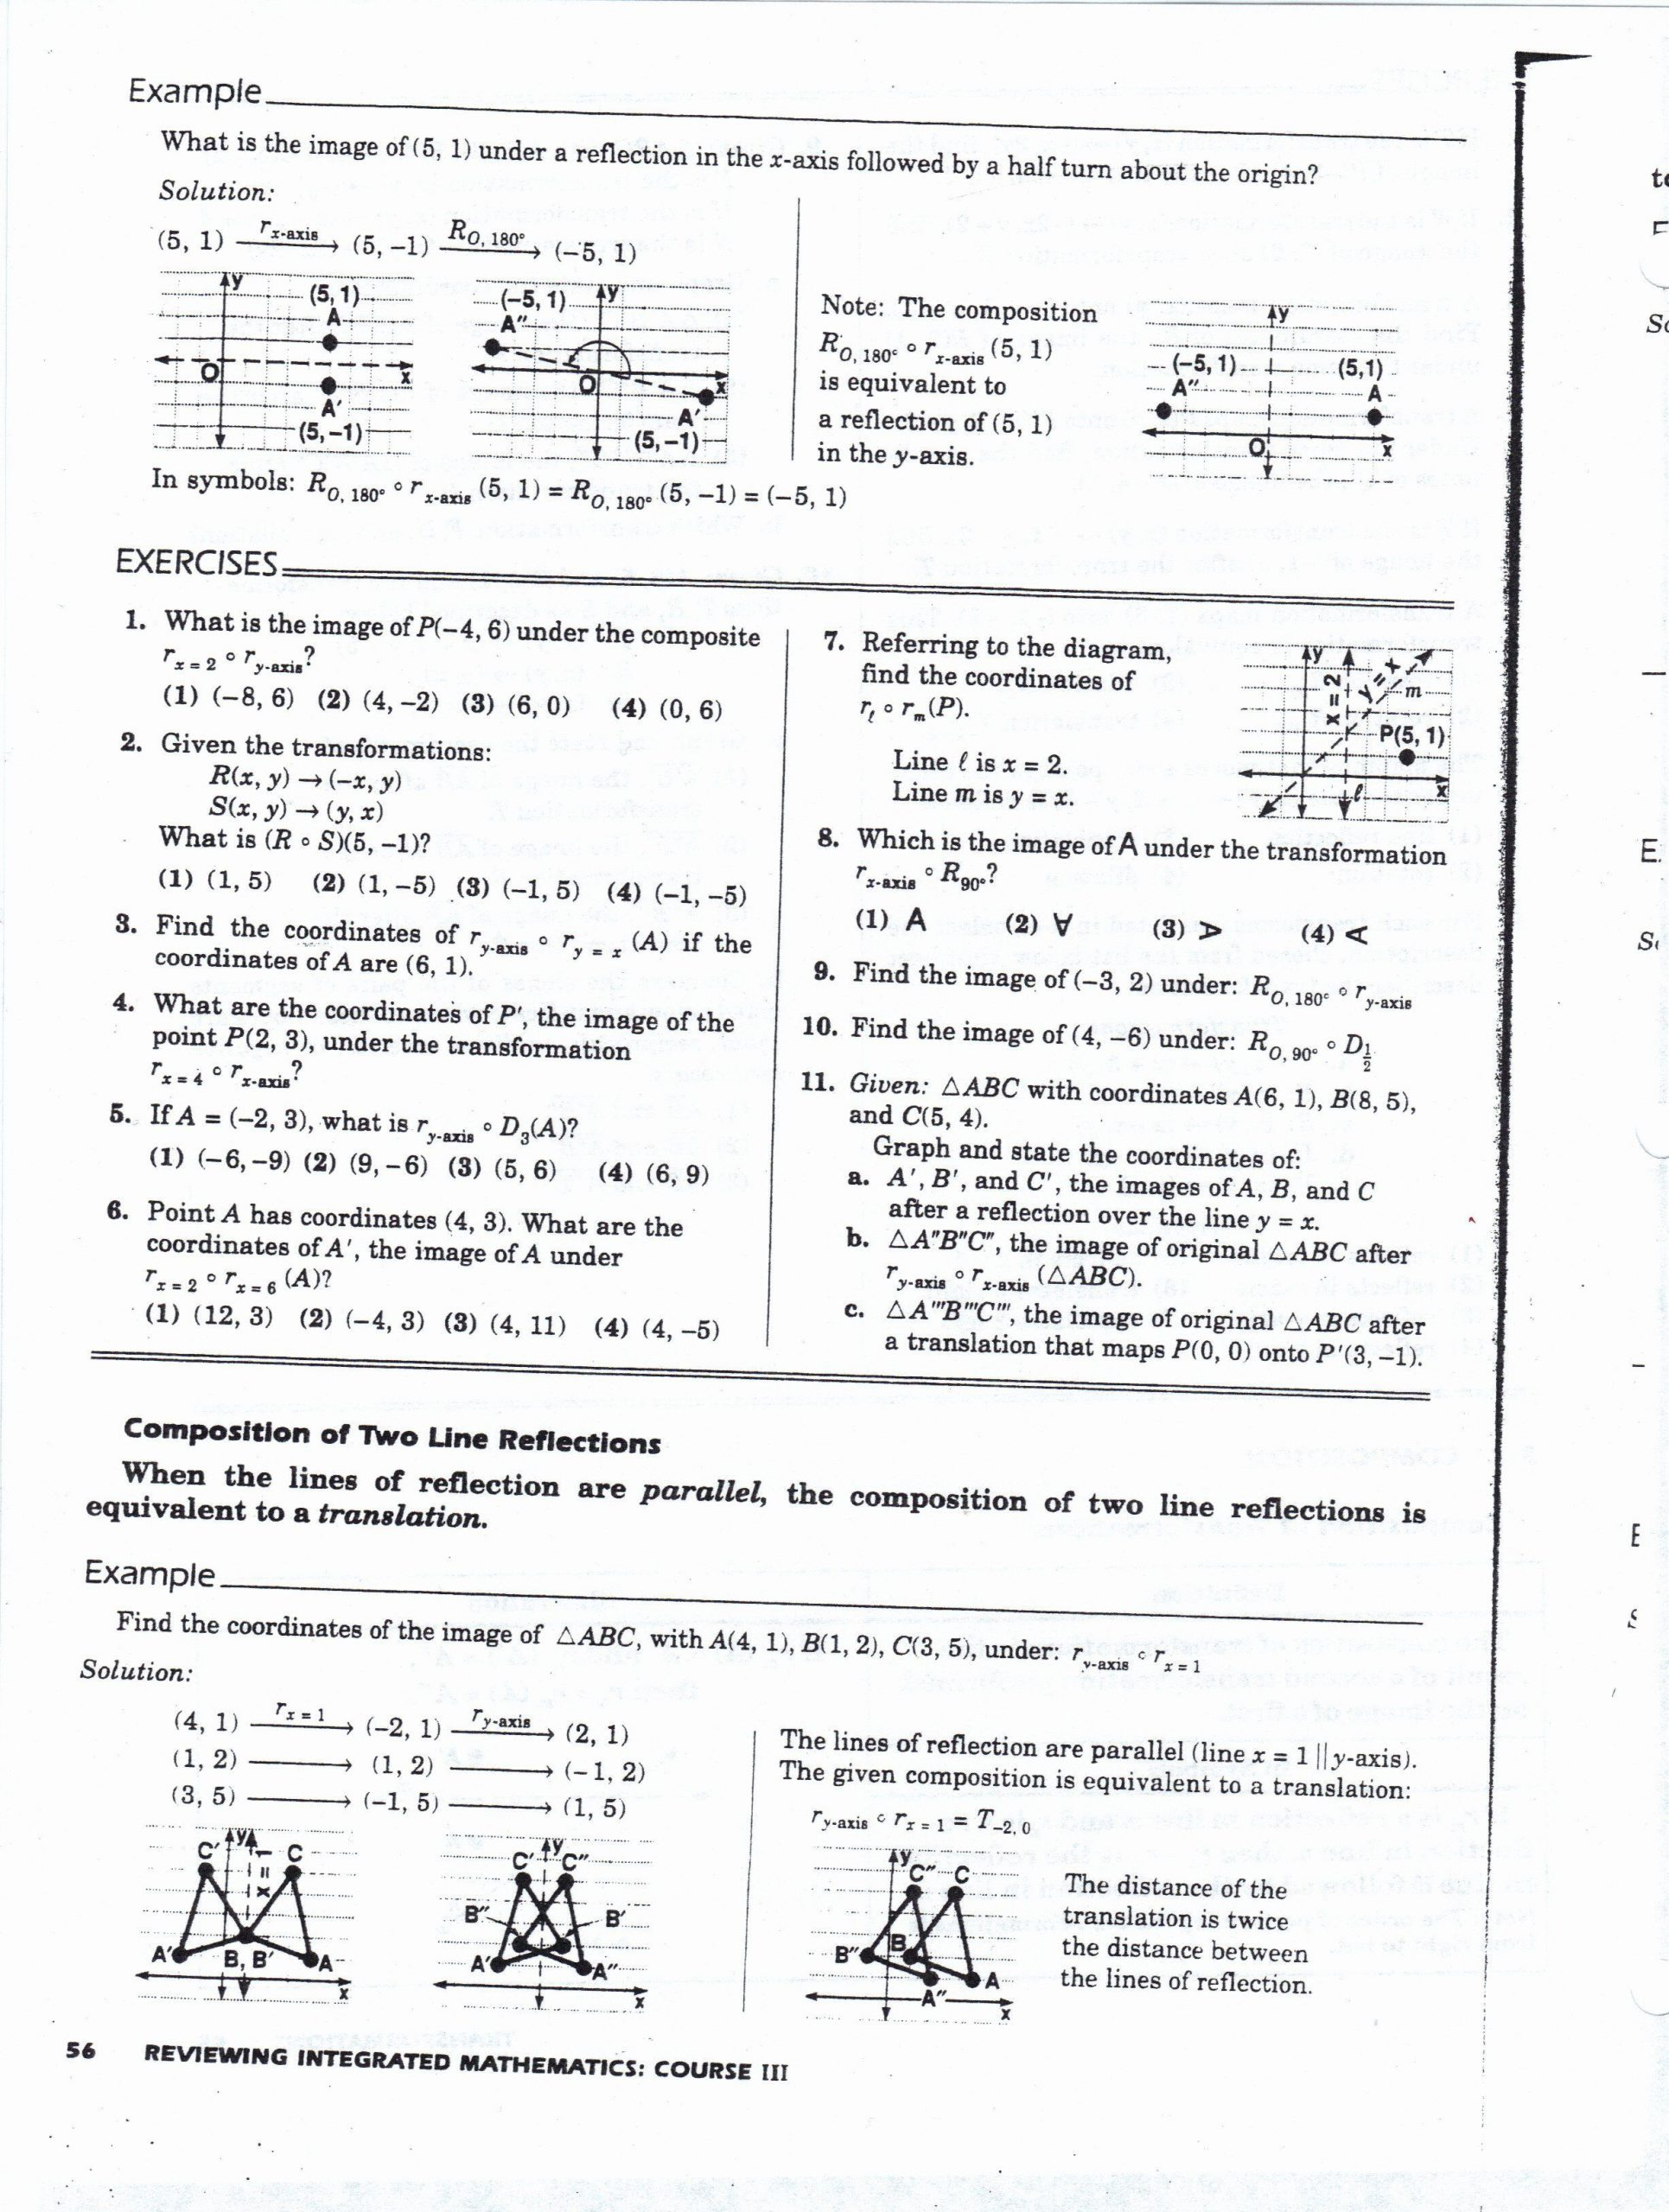 Midsegment theorem Worksheet Answer Key 50 Midsegment theorem Worksheet Answer Key In 2020